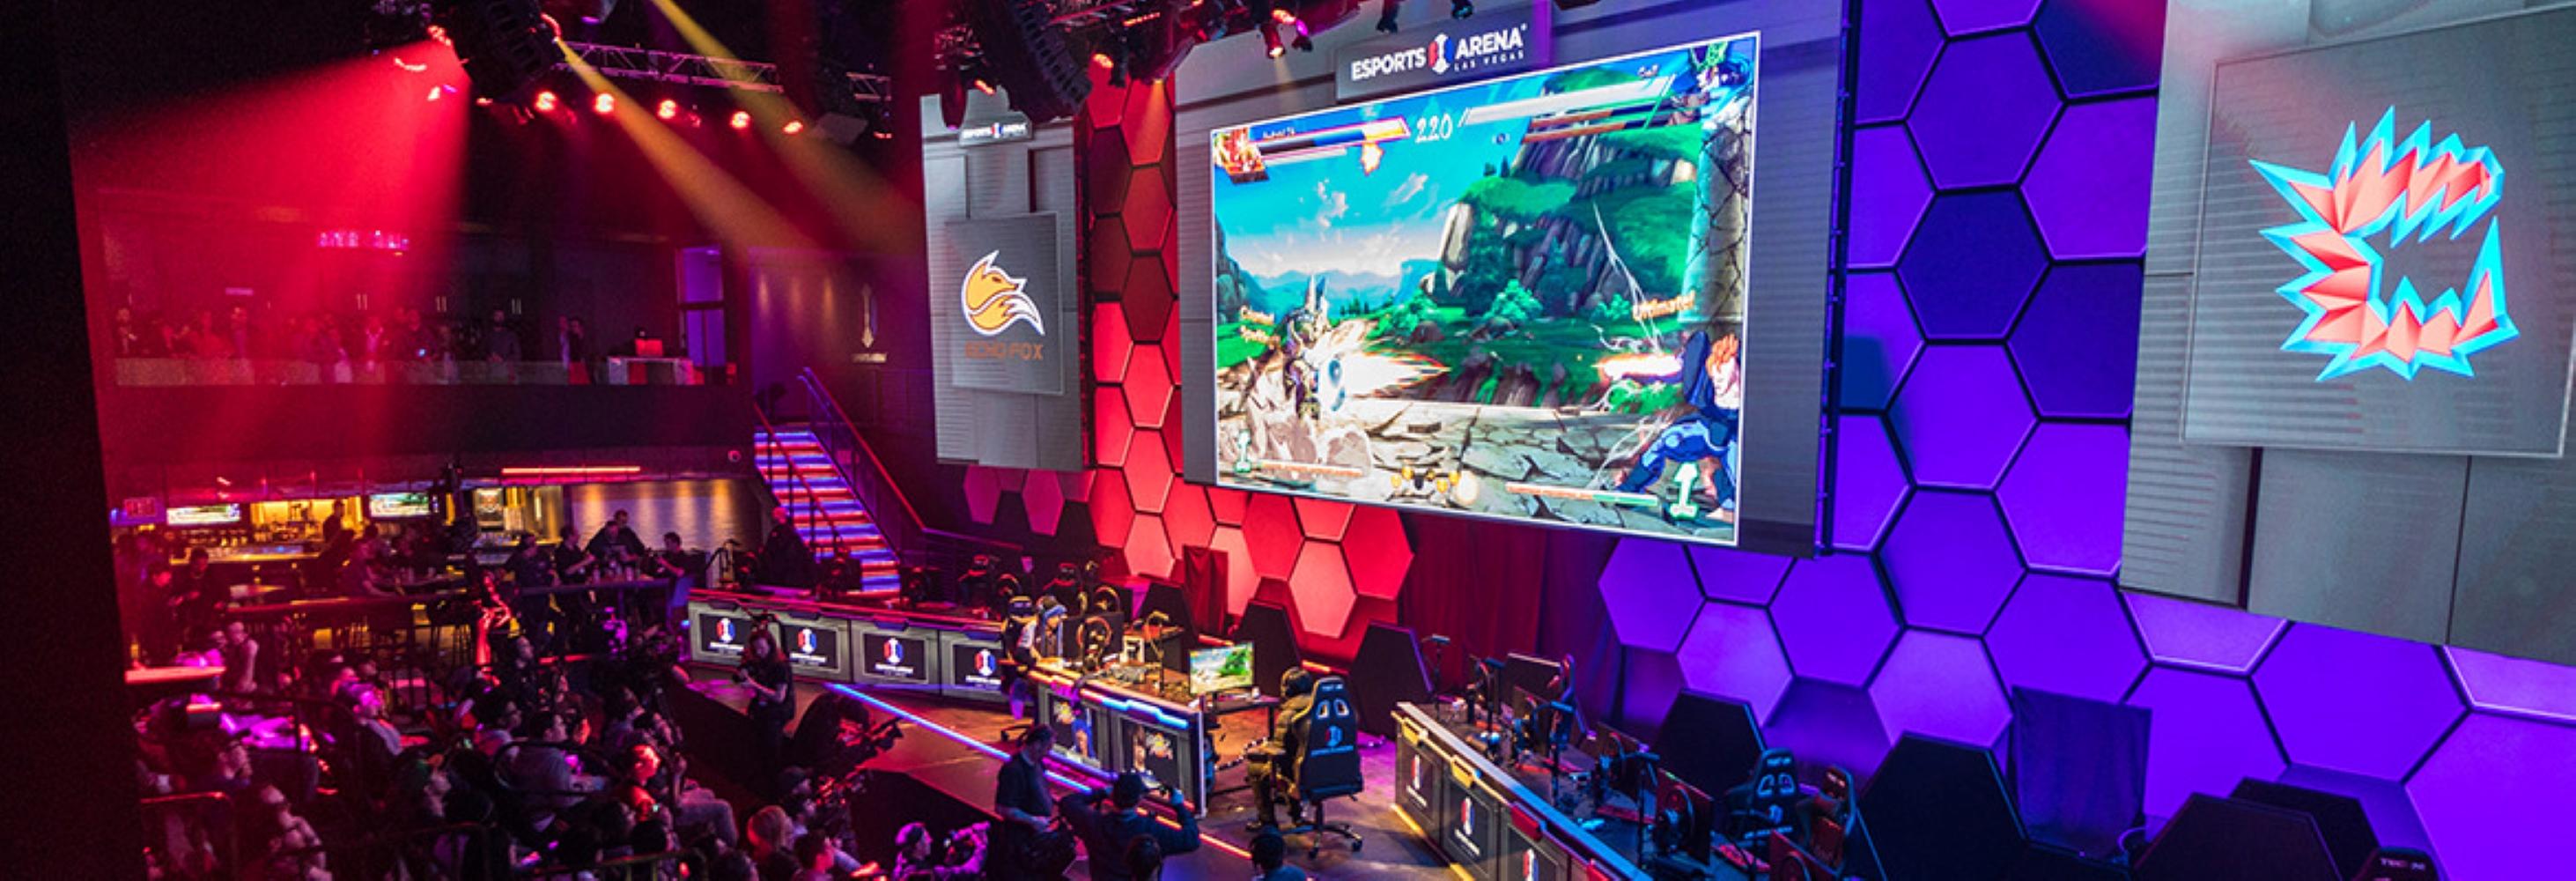 HARMAN_Esports_Arena_horiz-1000px_large